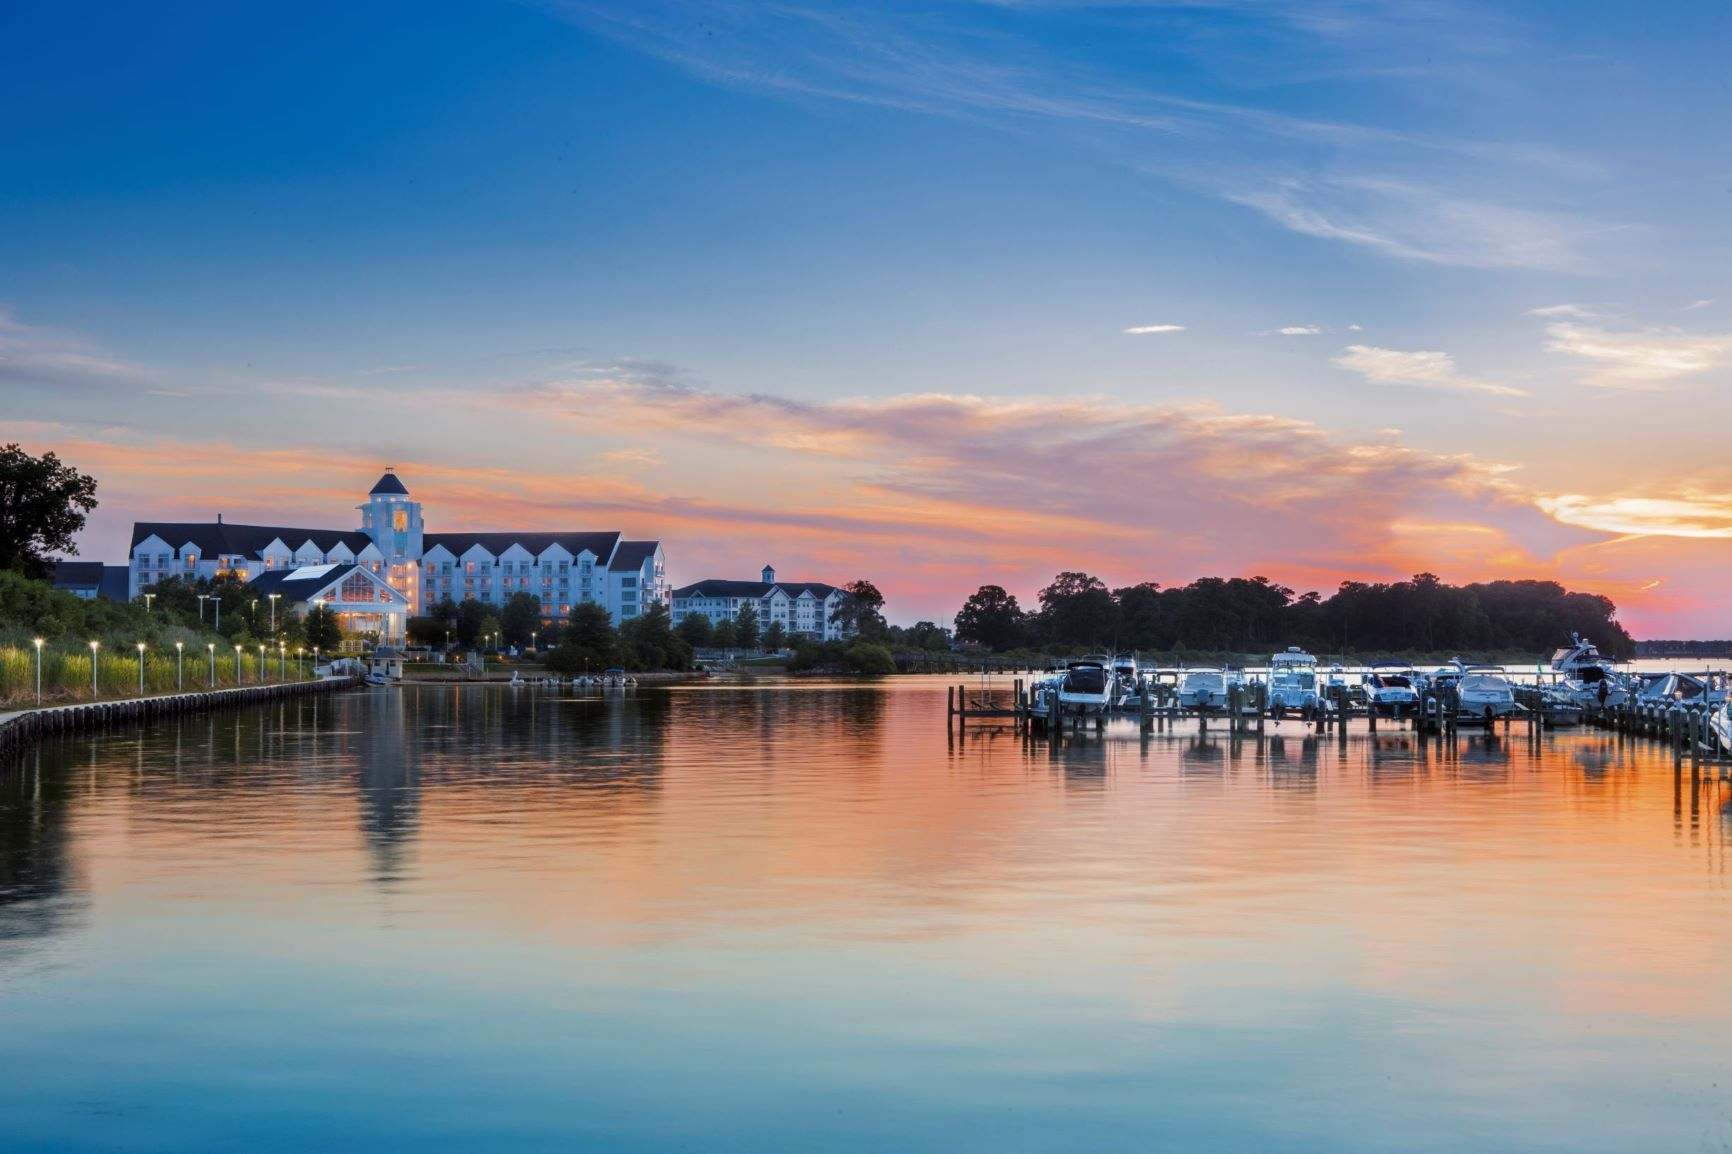 Valentine's Day Dinner at Hyatt Regency Chesapeake Bay Golf Resort, Spa and Marina